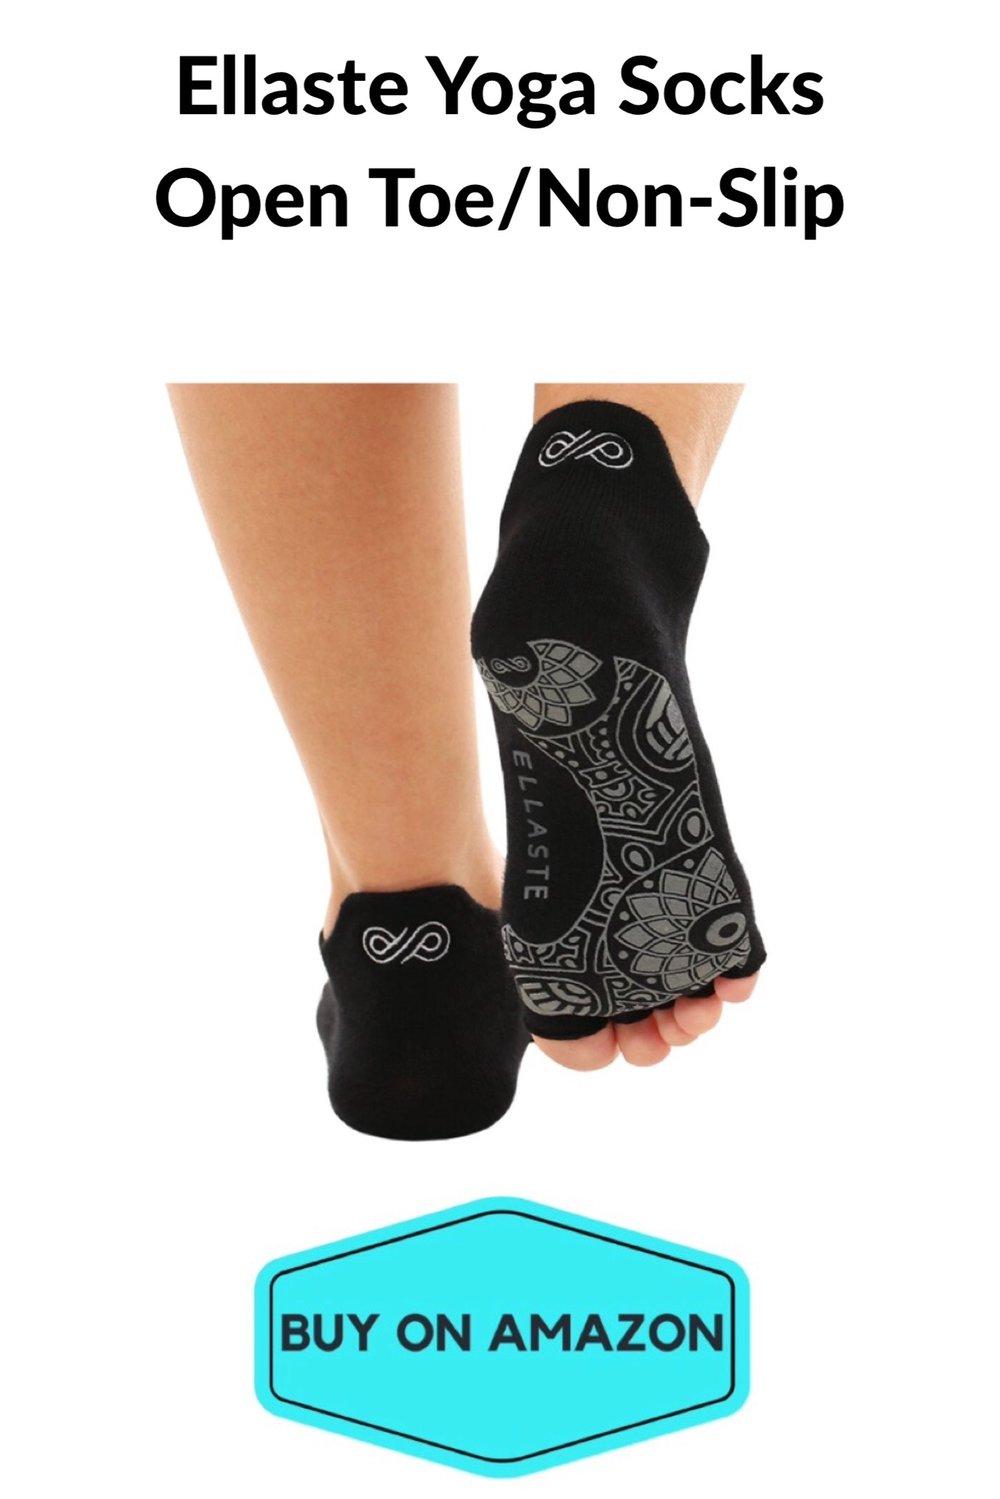 Ellaste Yoga Socks: Open Toe/Non-Slip